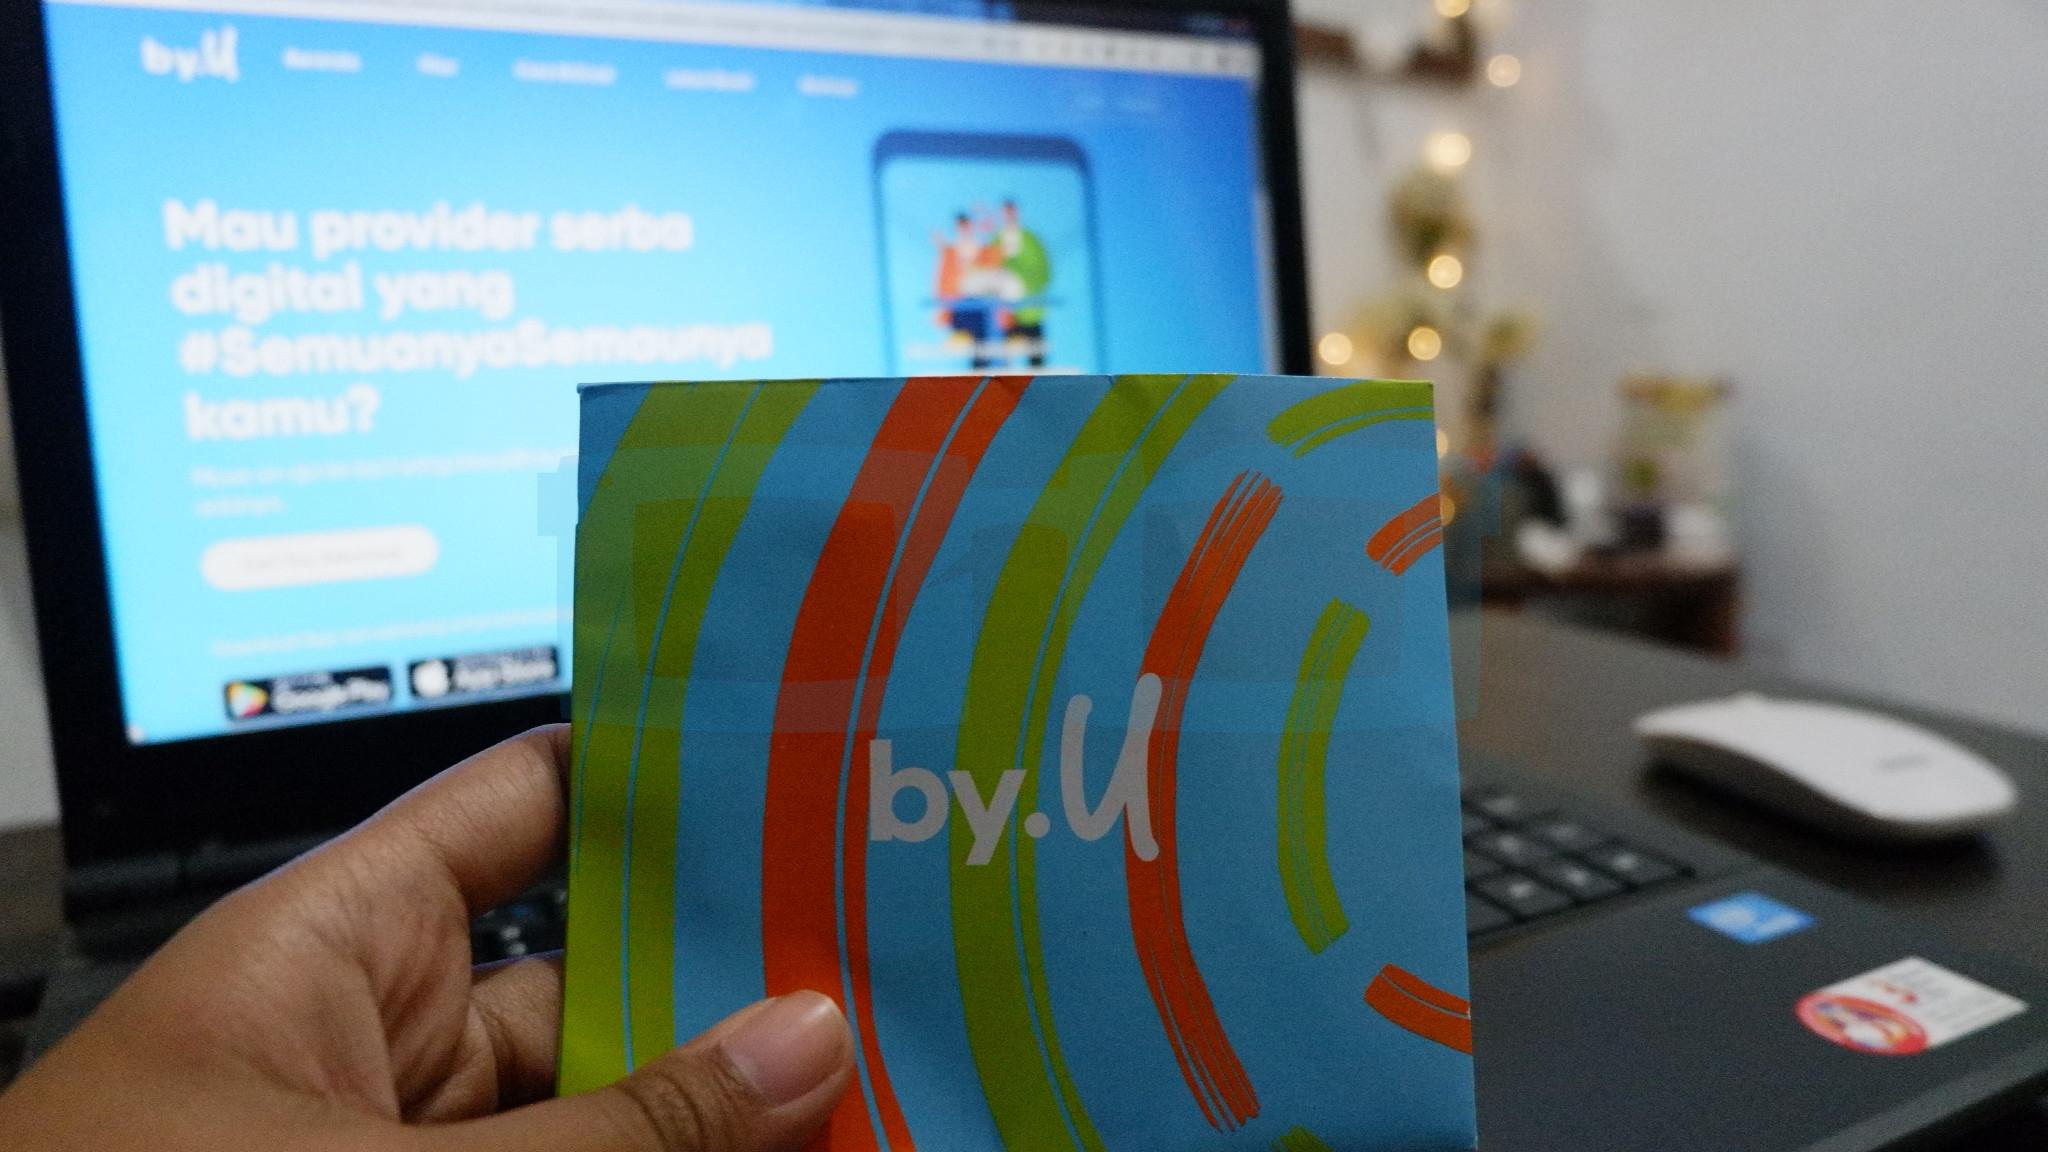 Cara Beli Kartu By U dari Telkomsel Online